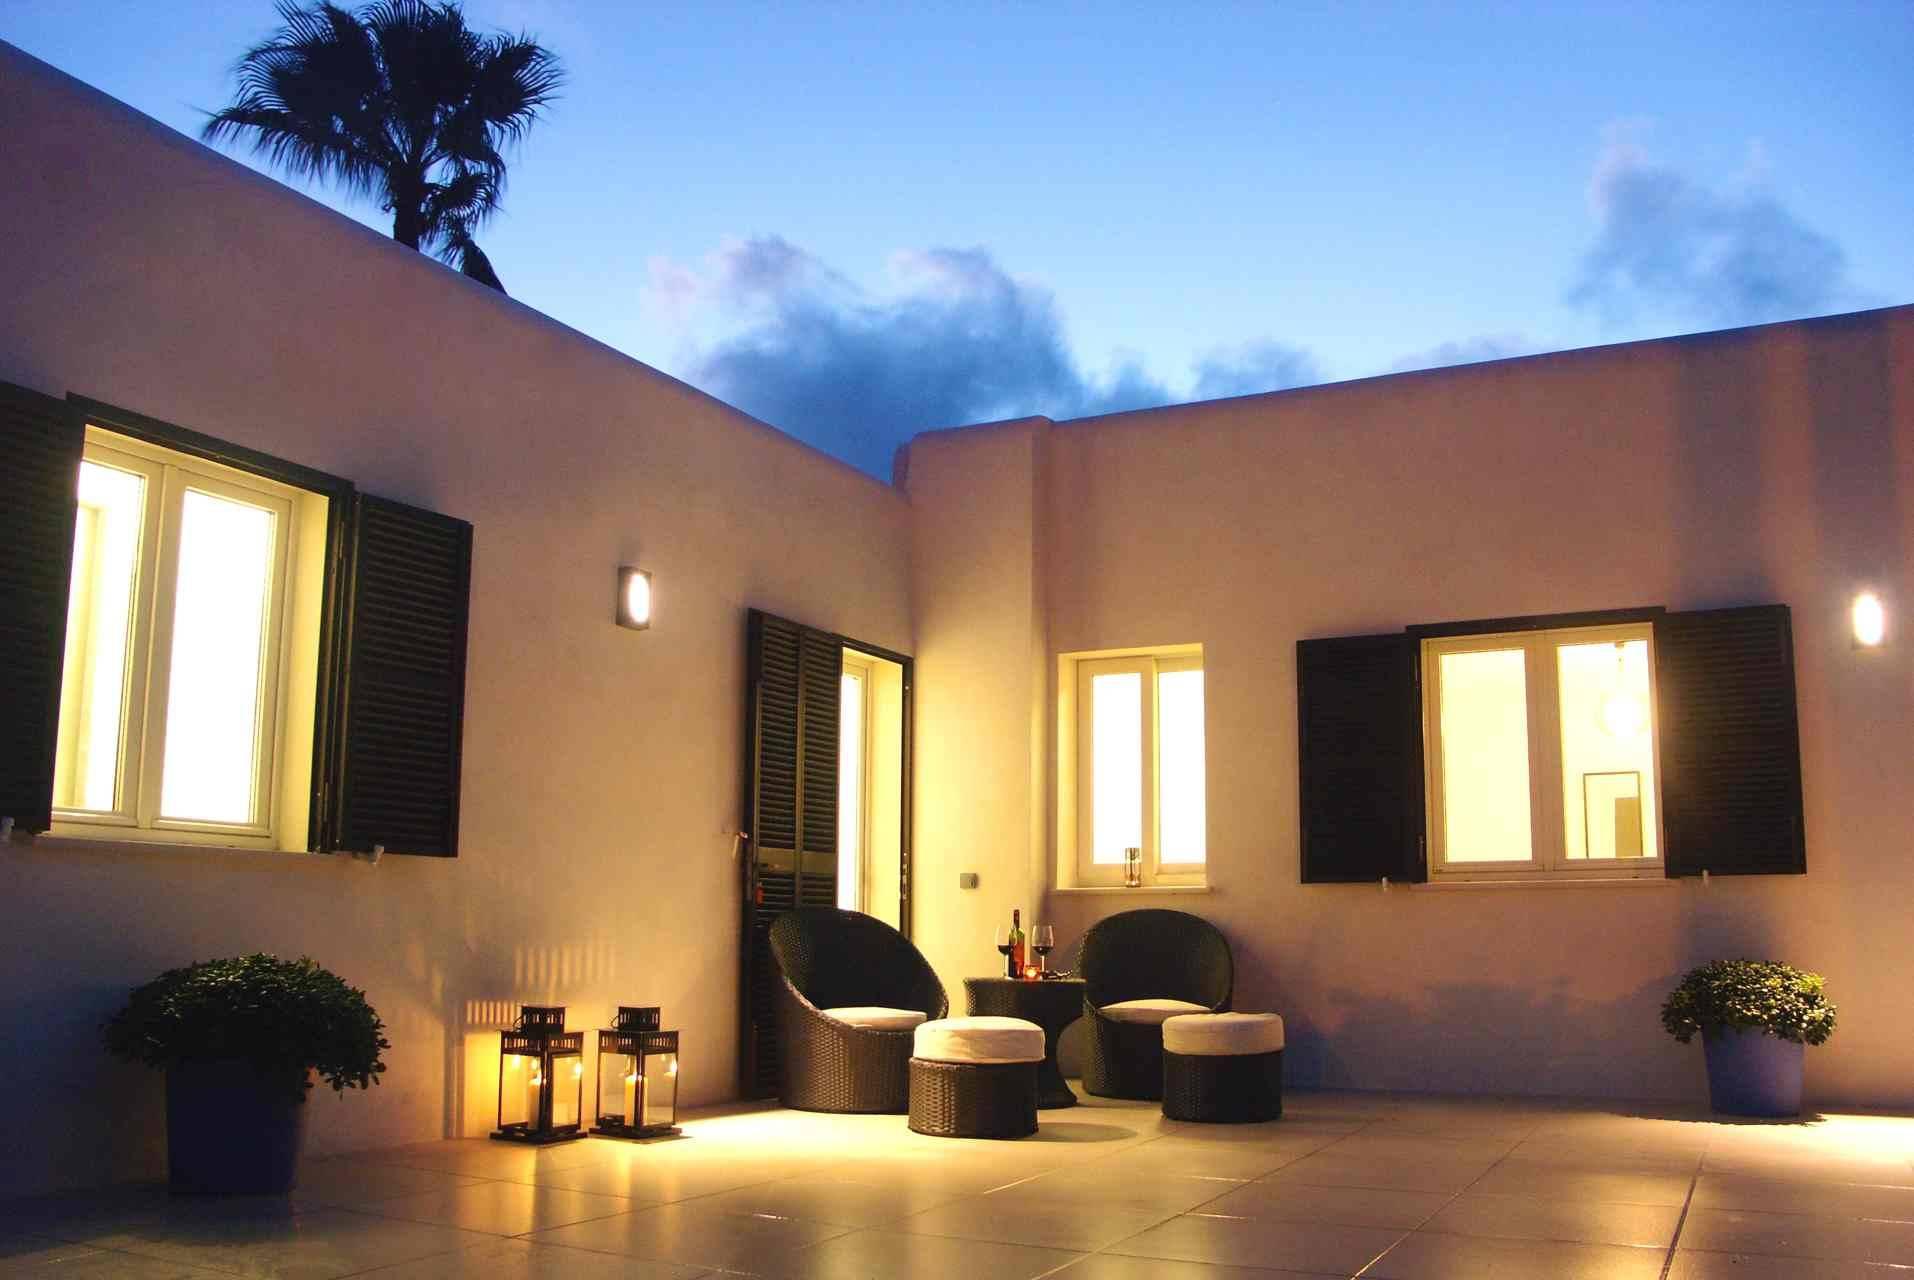 01-95 Ferienhaus Mallorca Süden mit Meerblick Bild 22